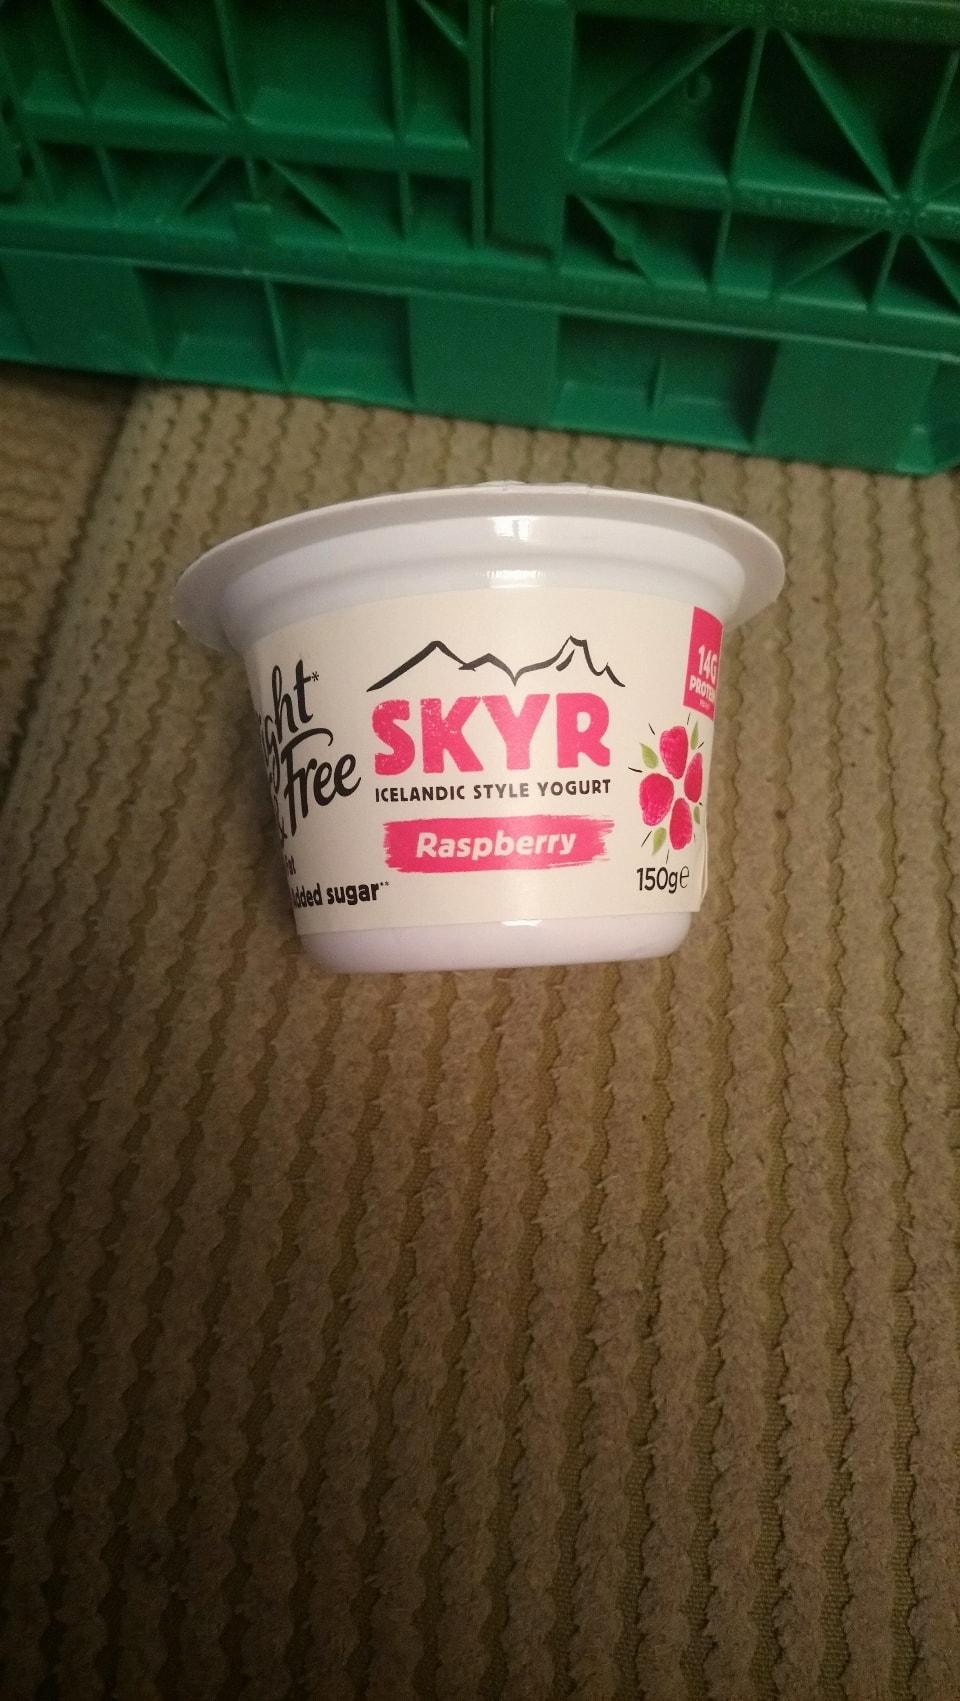 Light and free skyr yogurt